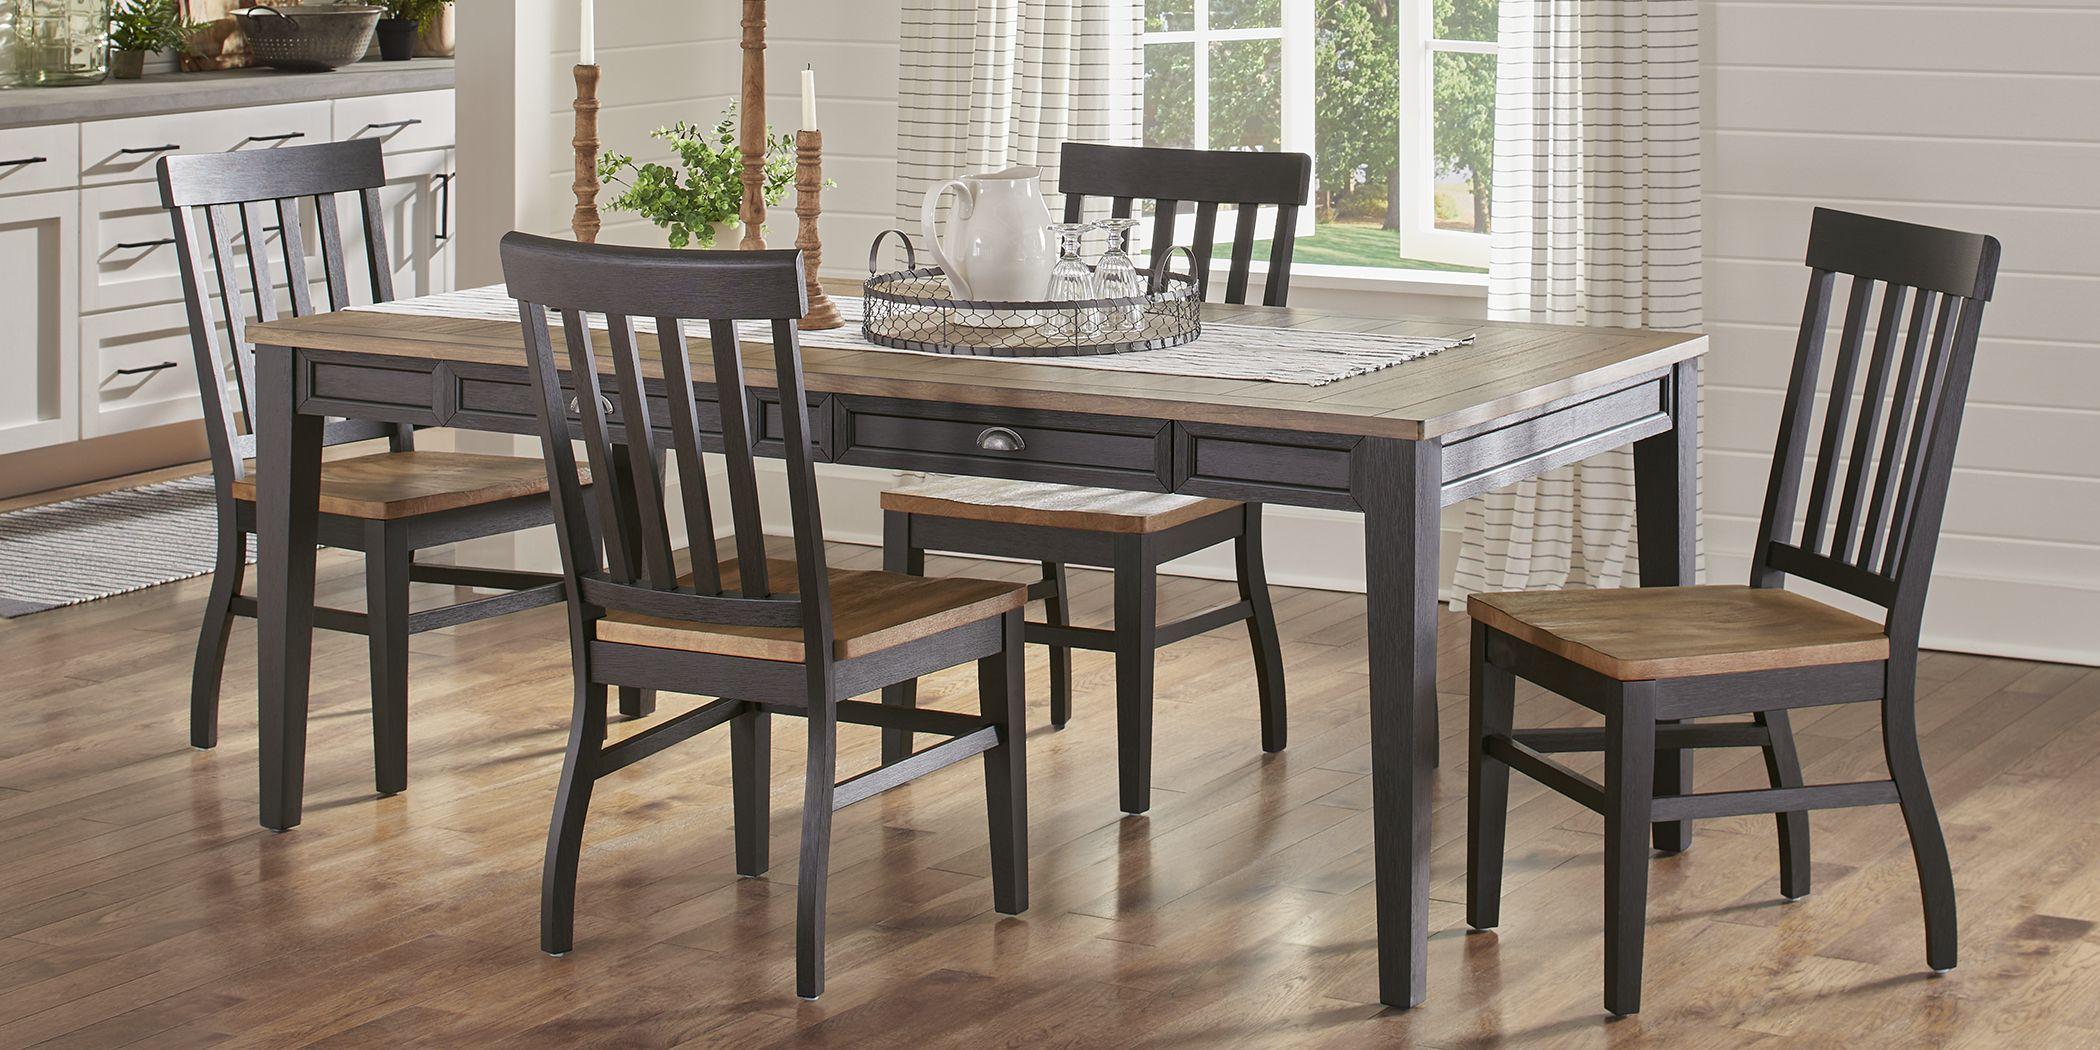 Keston Black 5 Pc Rectangle Dining Room